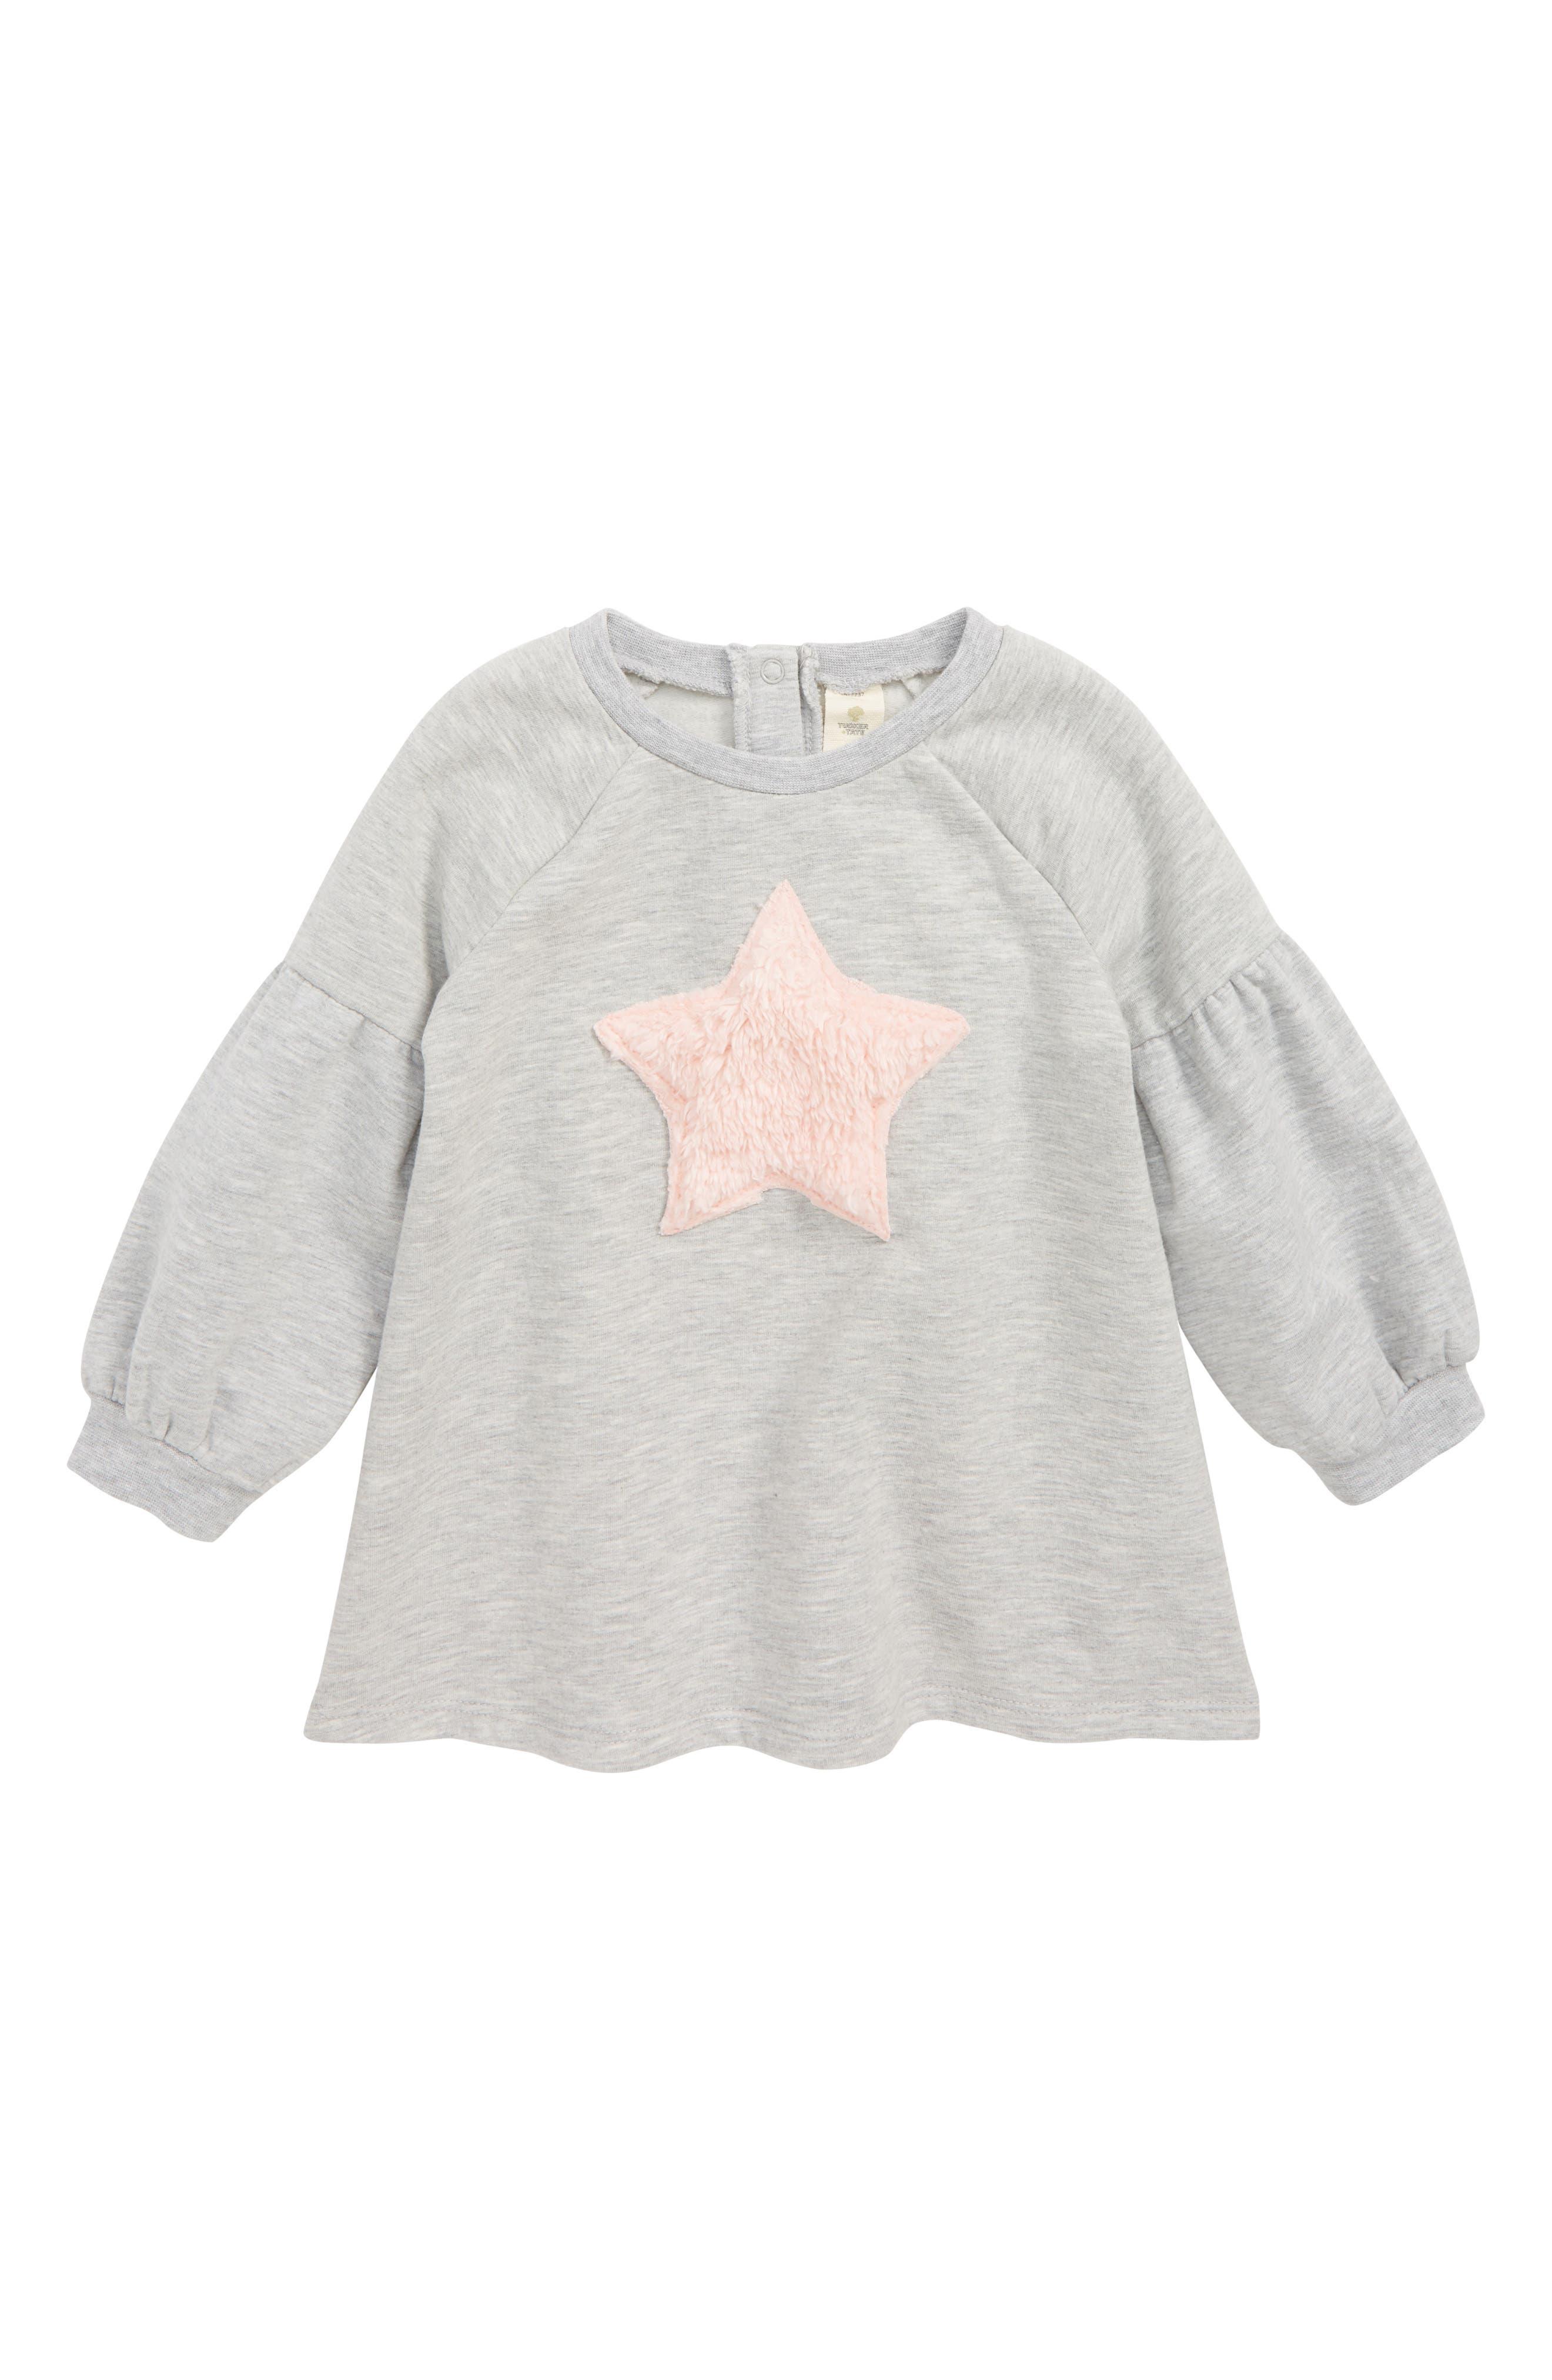 Infant Girls Tucker  Tate Applique Dress Size 18M  Grey